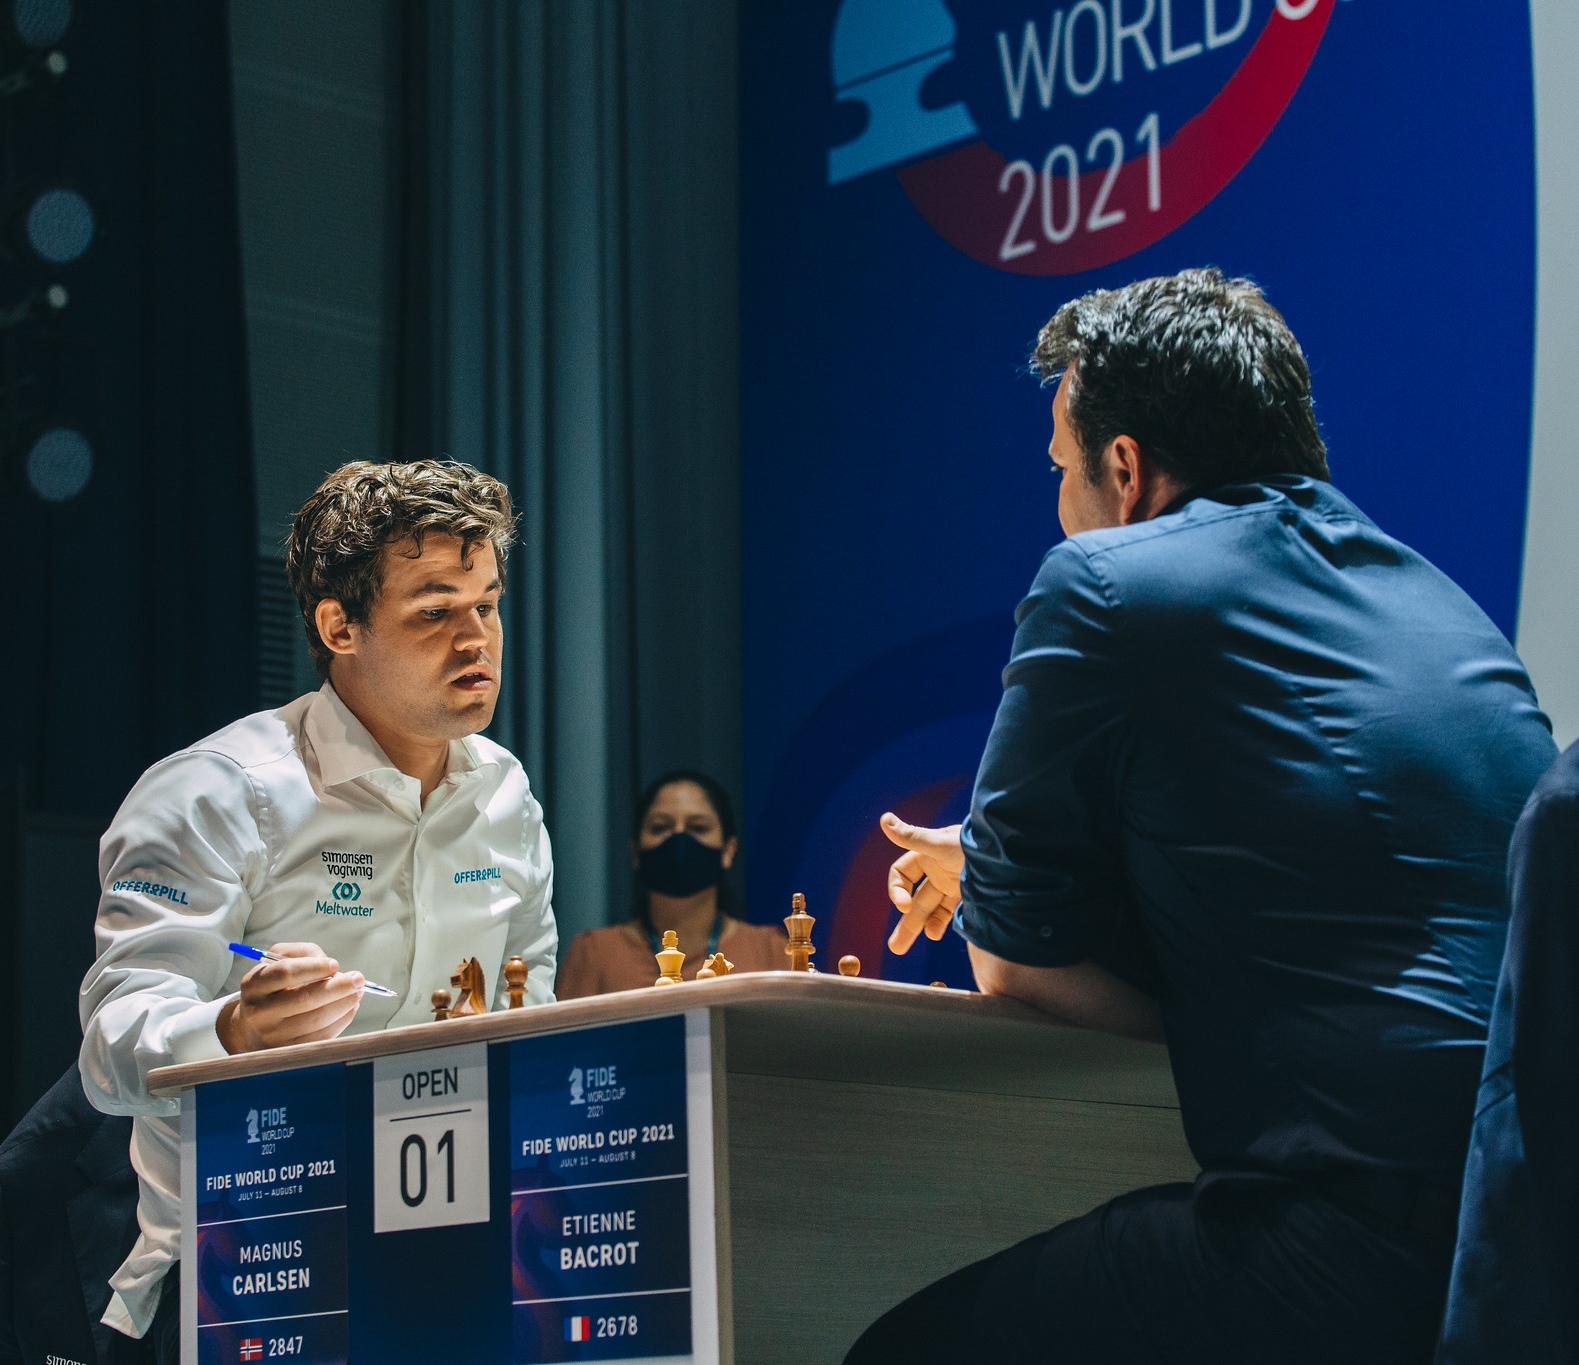 FIDE World Cup semis: Carlsen vs Duda